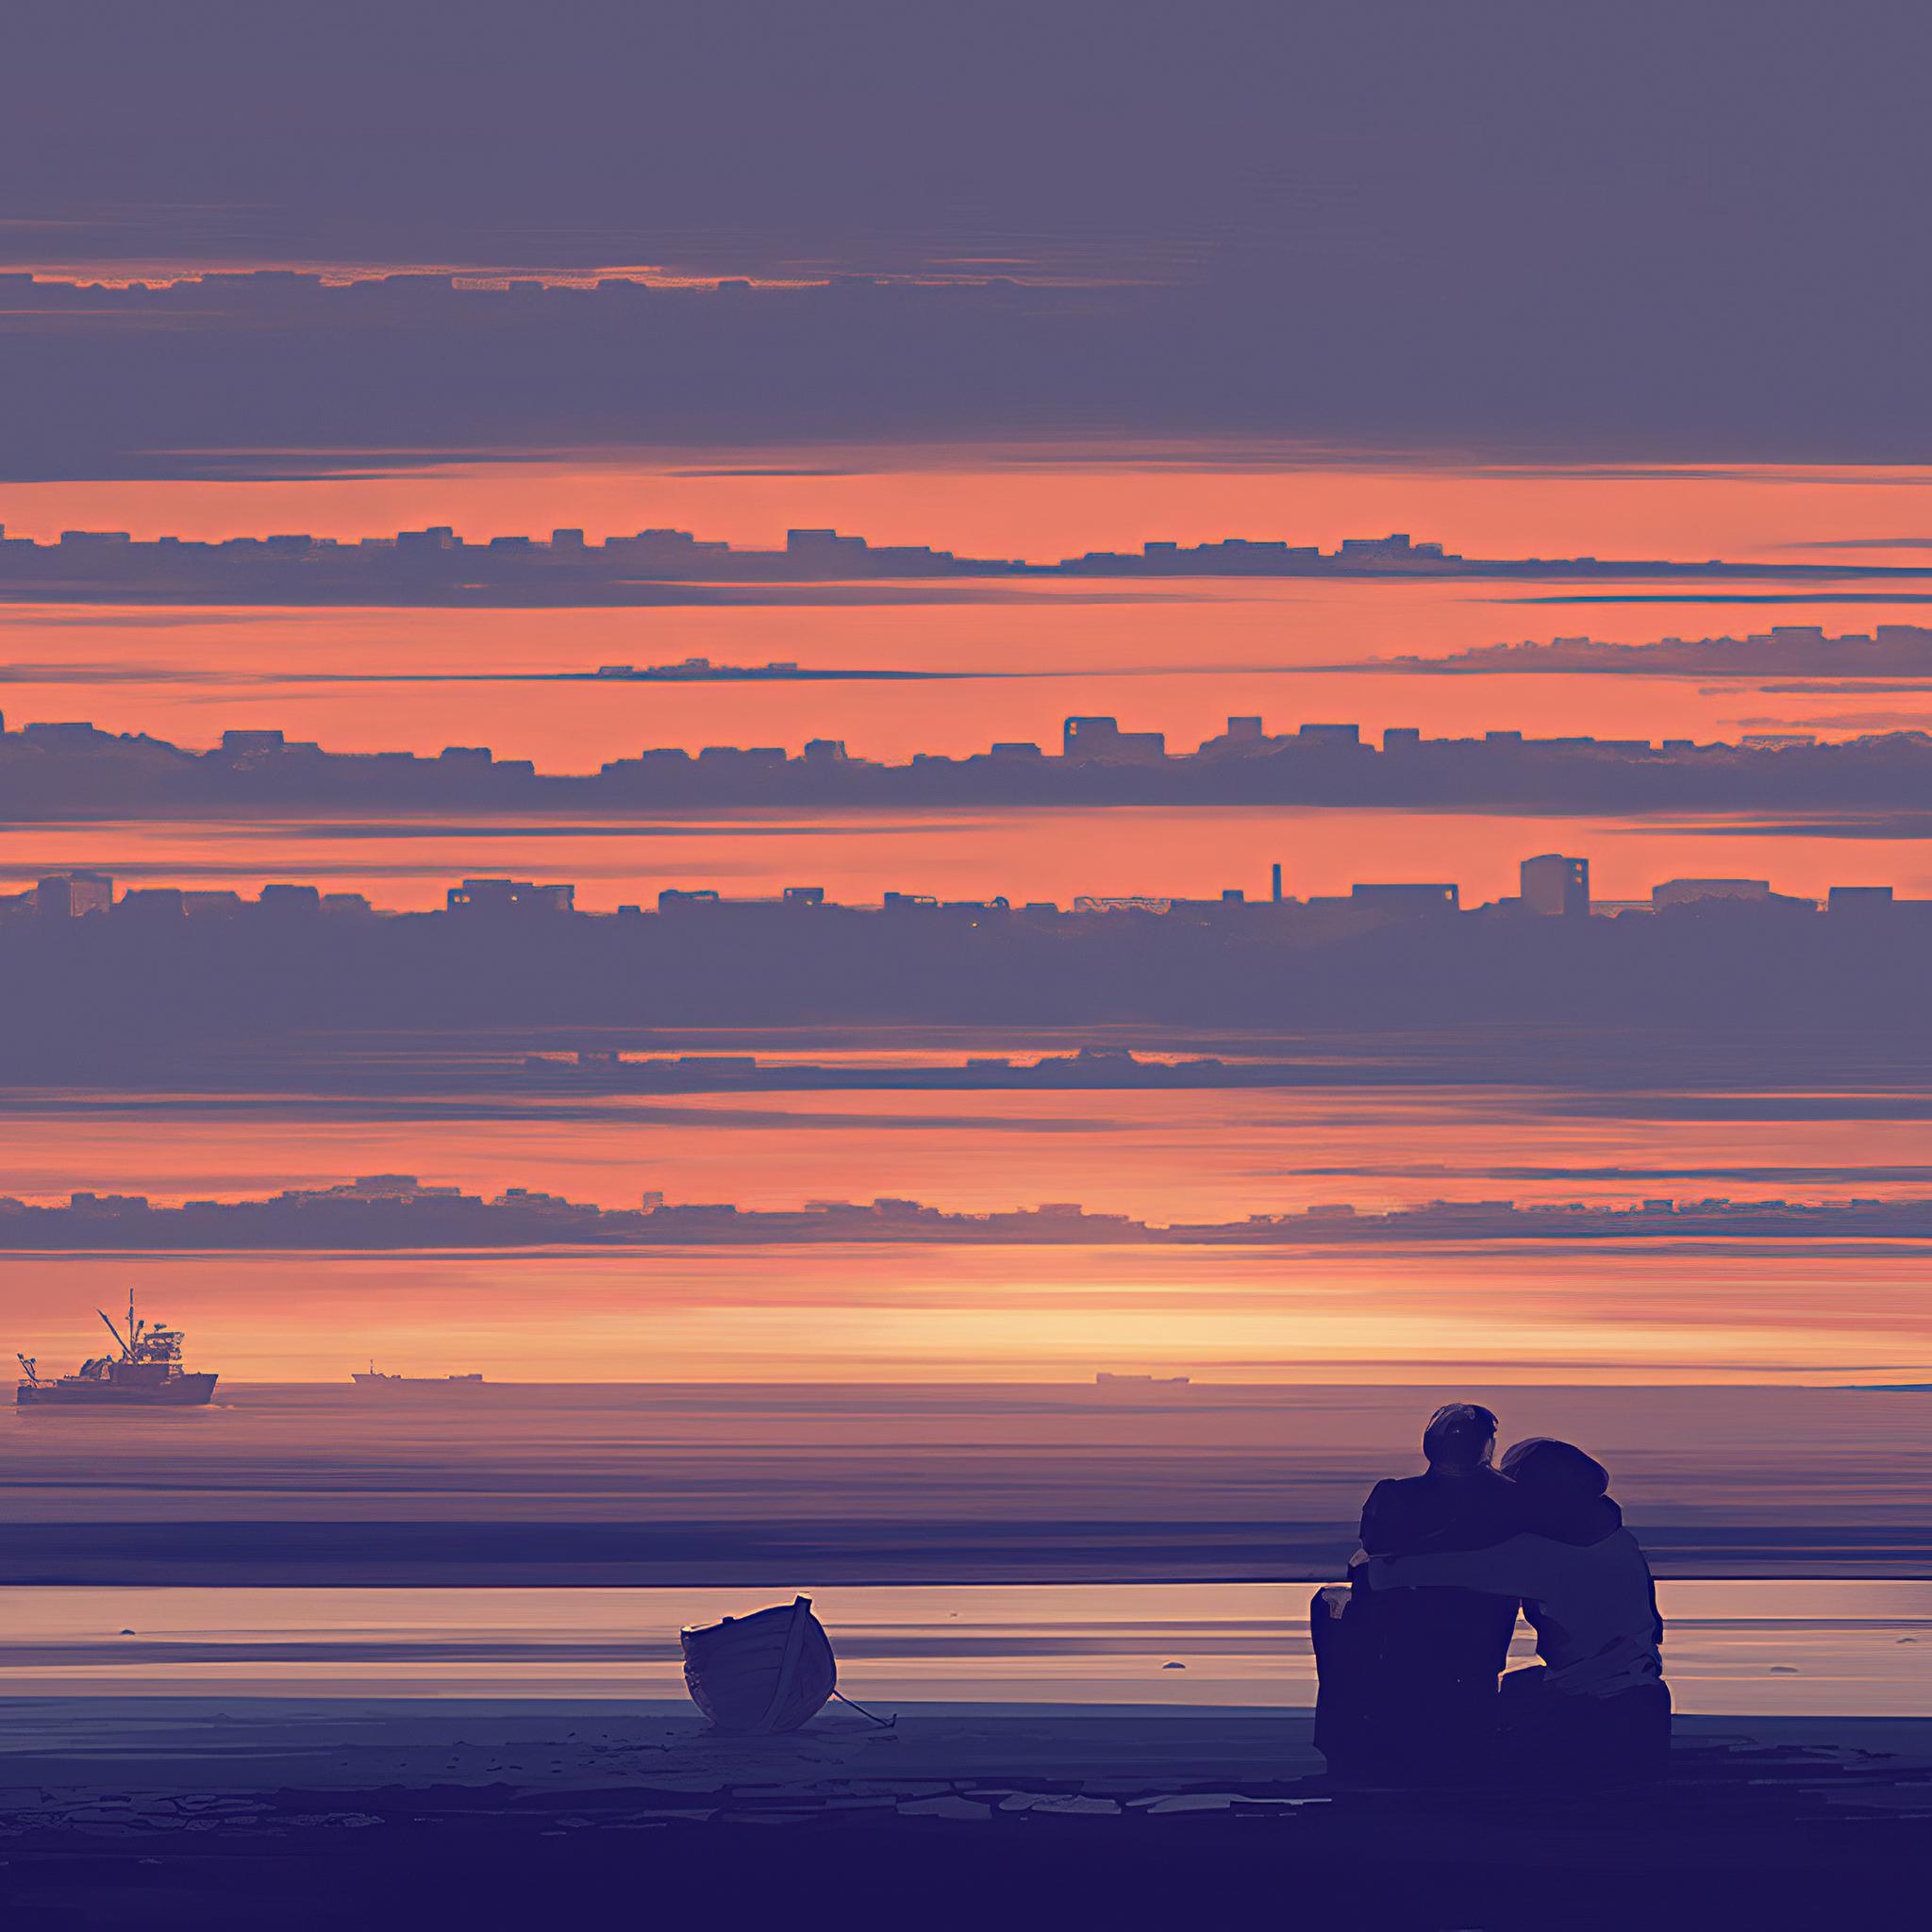 couple-in-love-sea-side-4k-uh.jpg